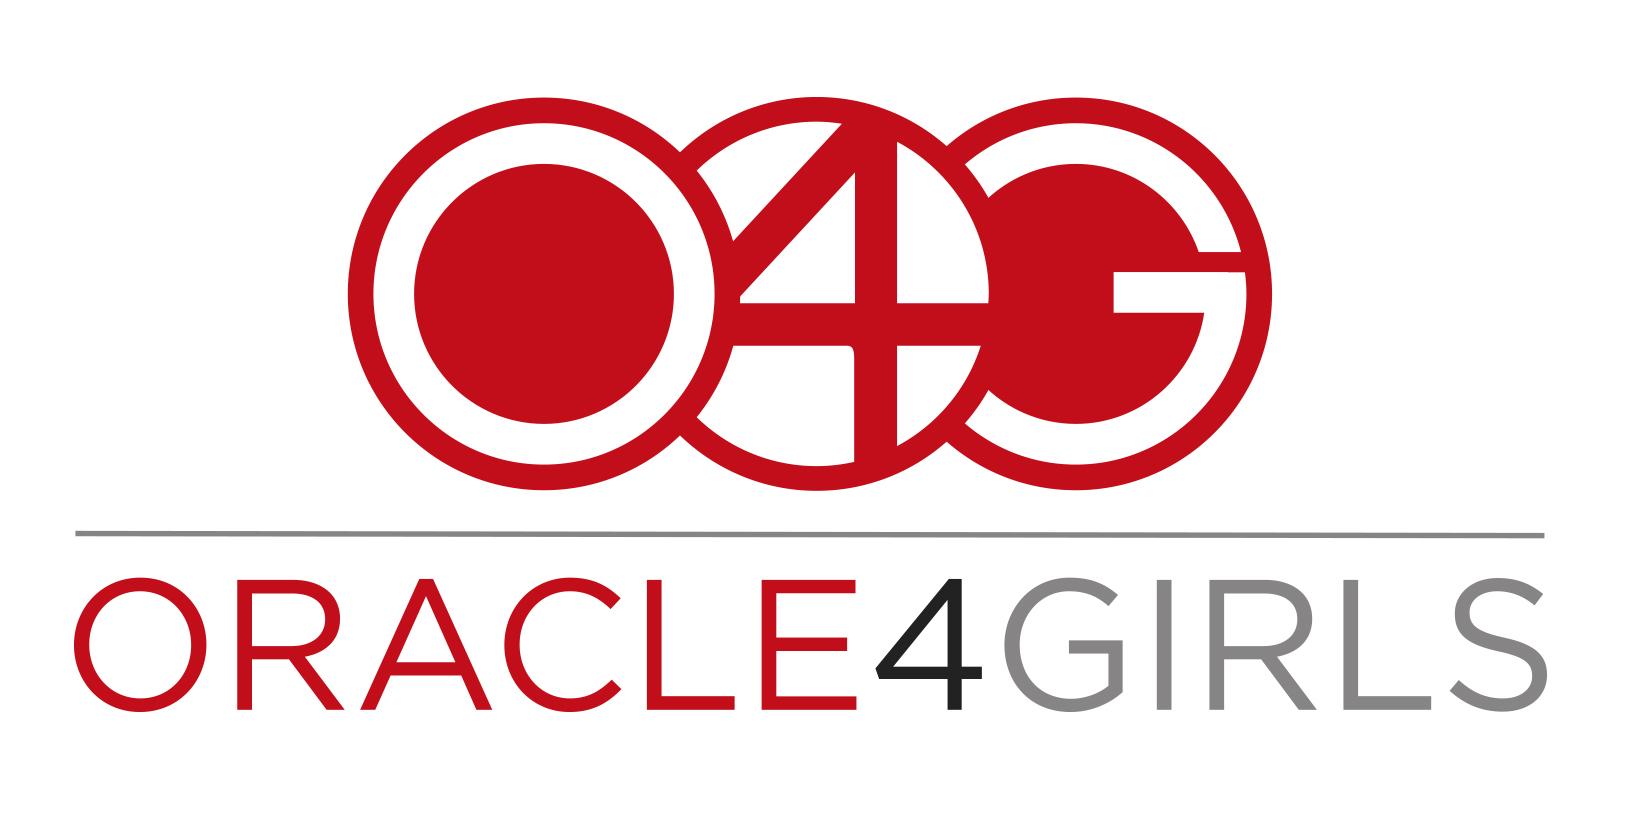 "4. PARTICIPACIÓ EN PROJECTES - 2. Projecte Oracle4Girls"""